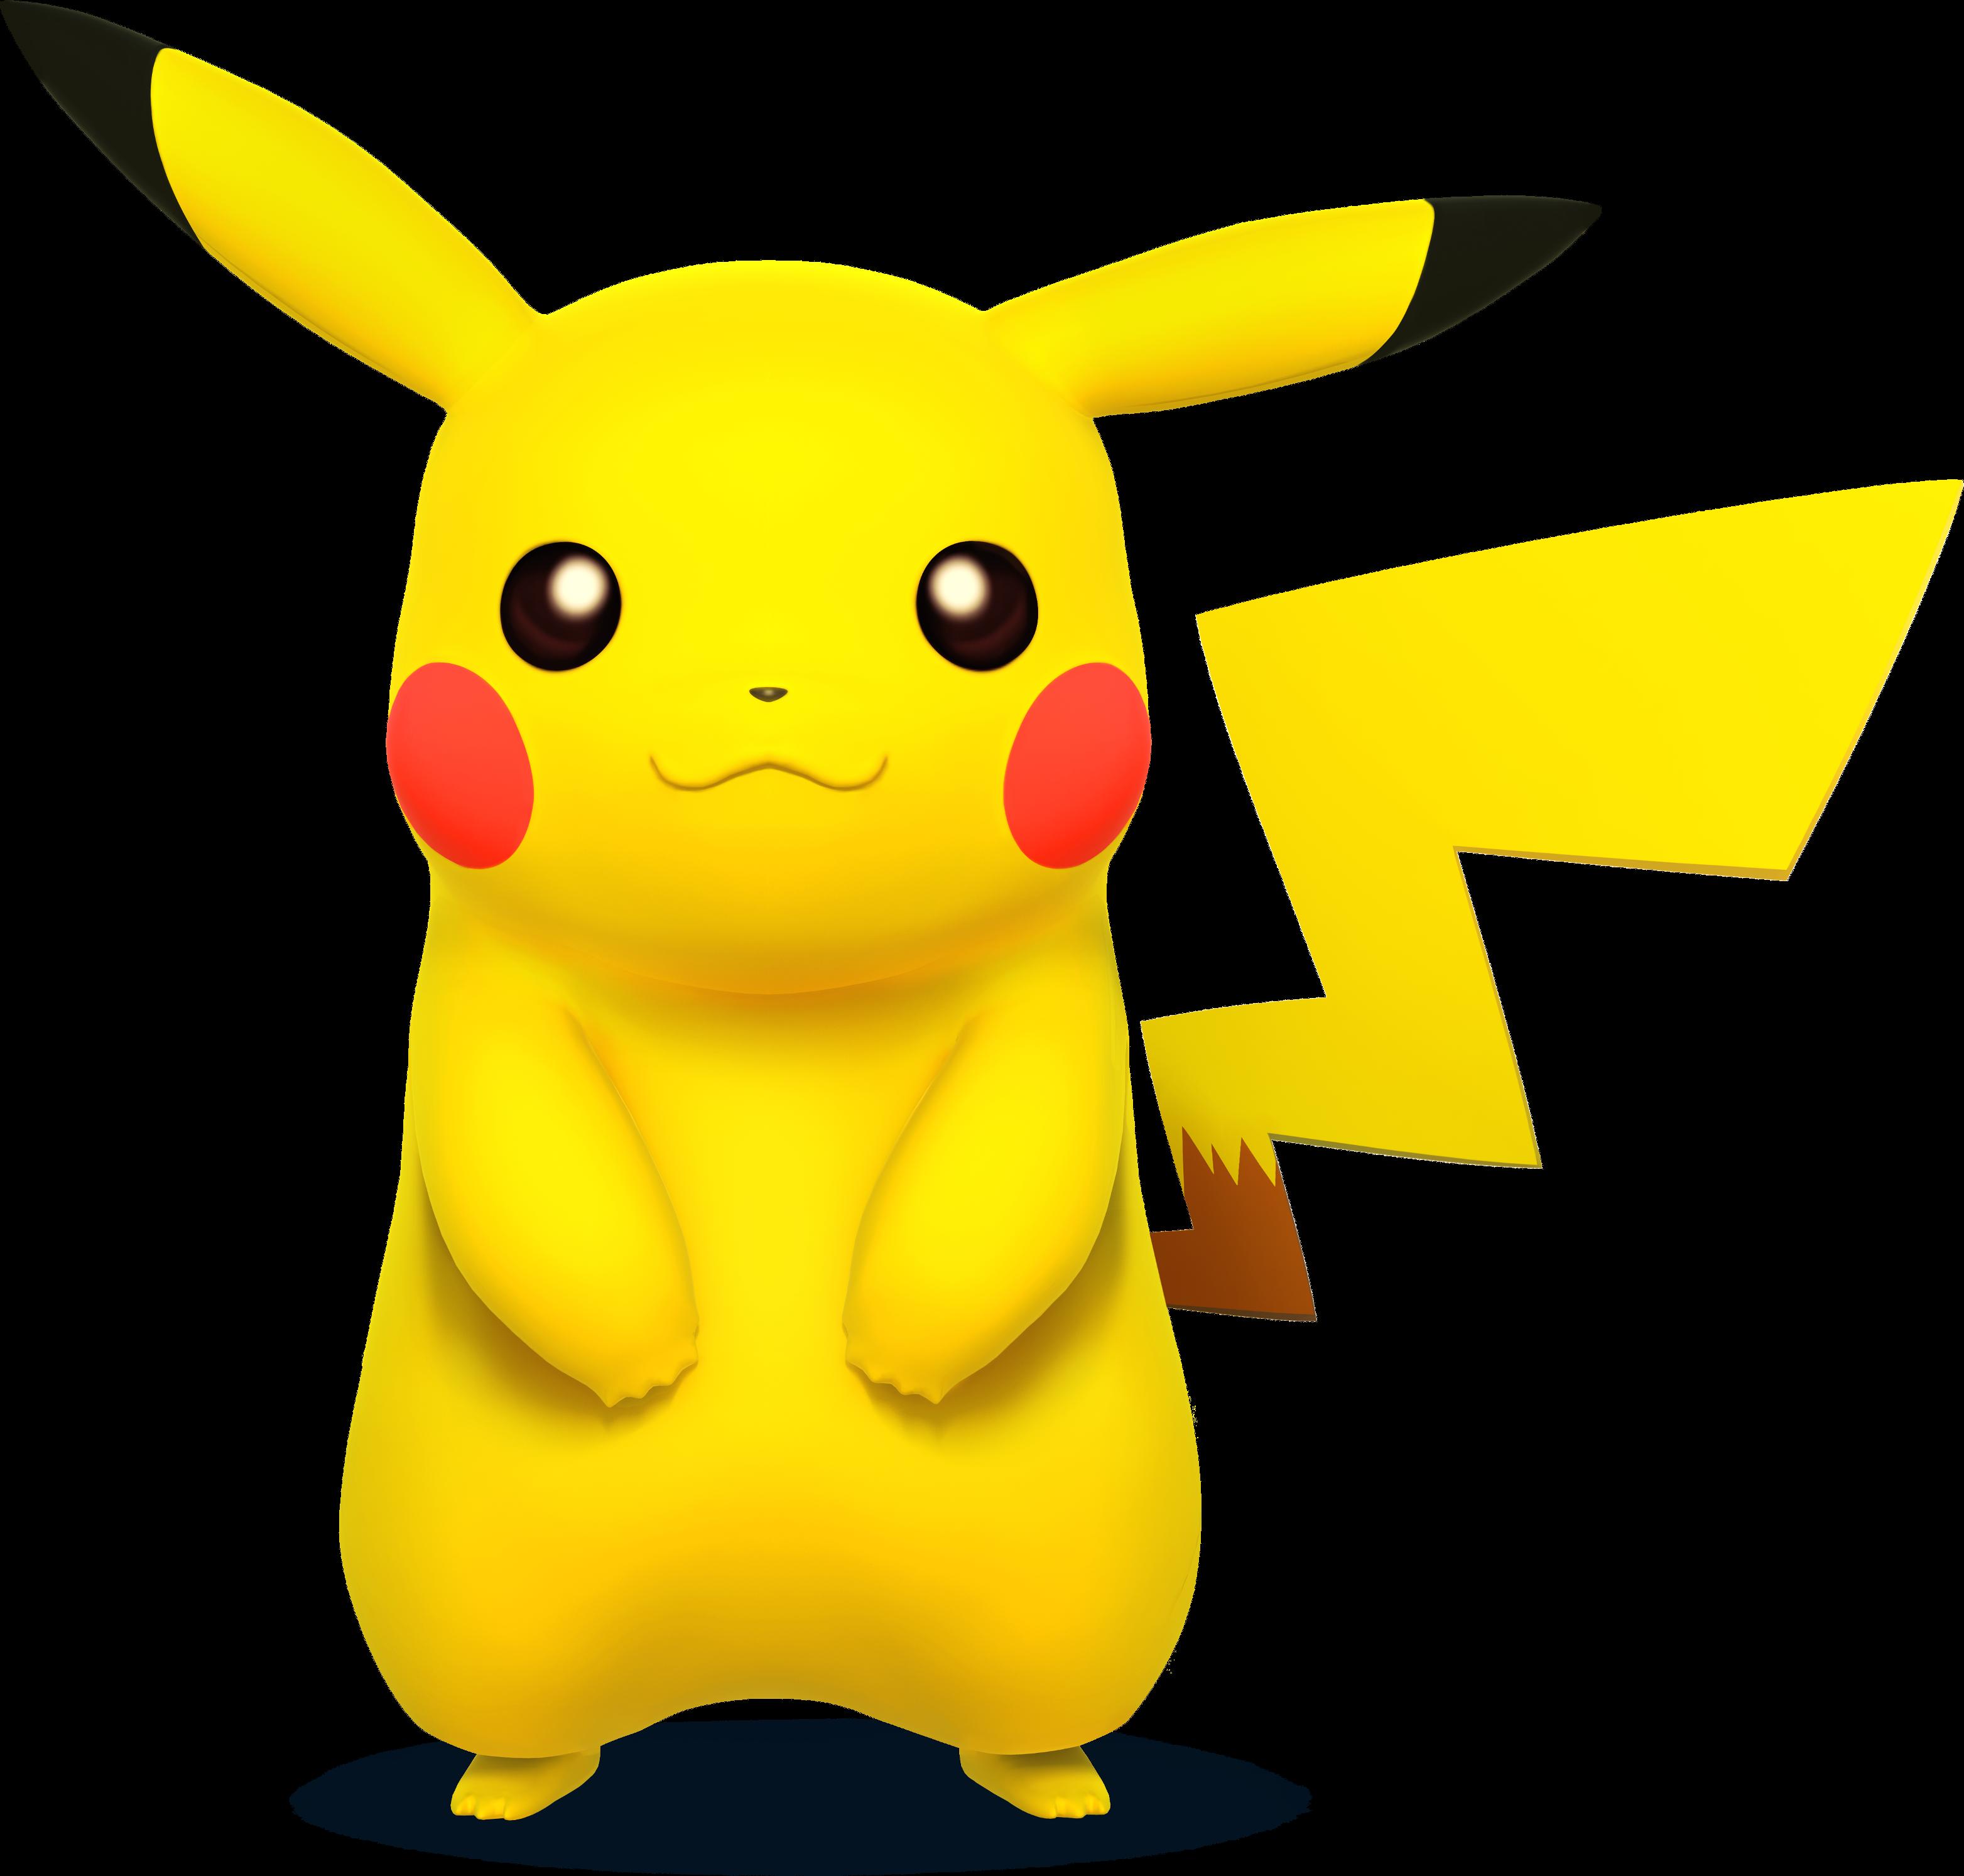 Super Smash Bros 3DS/Wii U Pikachu_SSB4